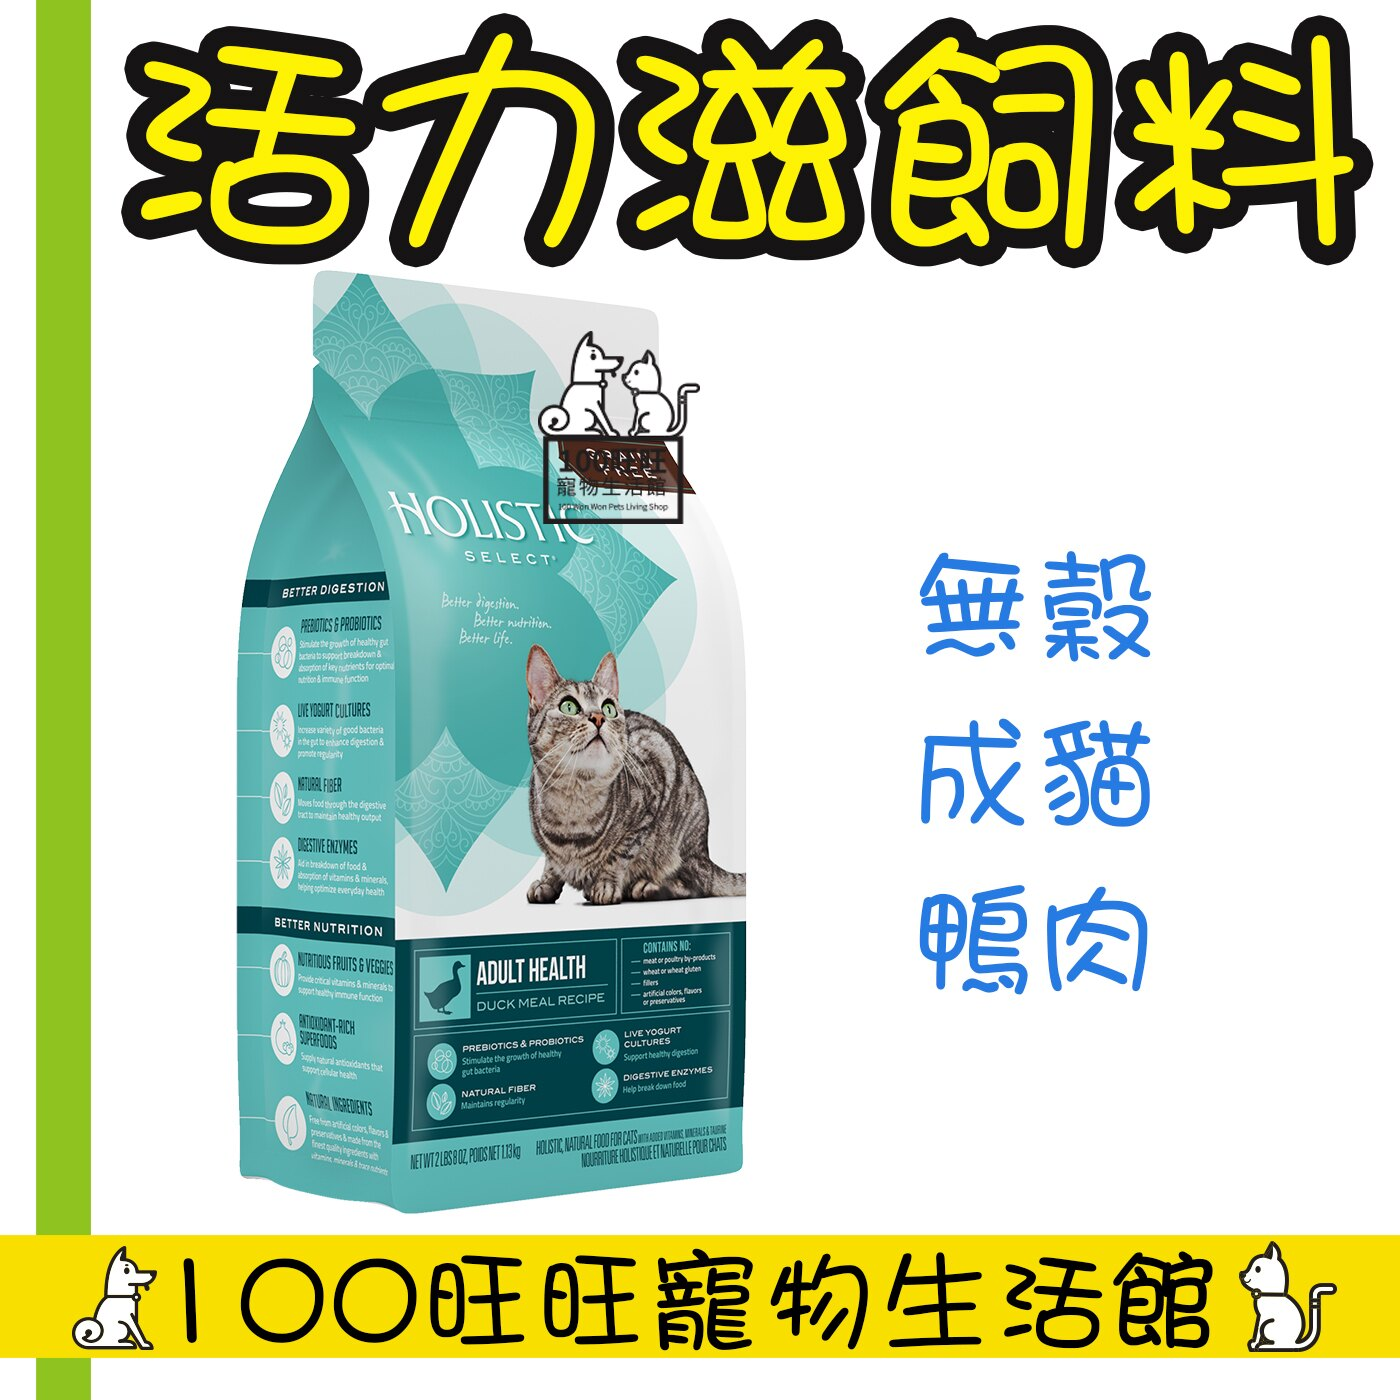 Holistic Select 活力滋 無穀成貓 鴨肉低敏除臭配方 2.5磅 1.13 kg